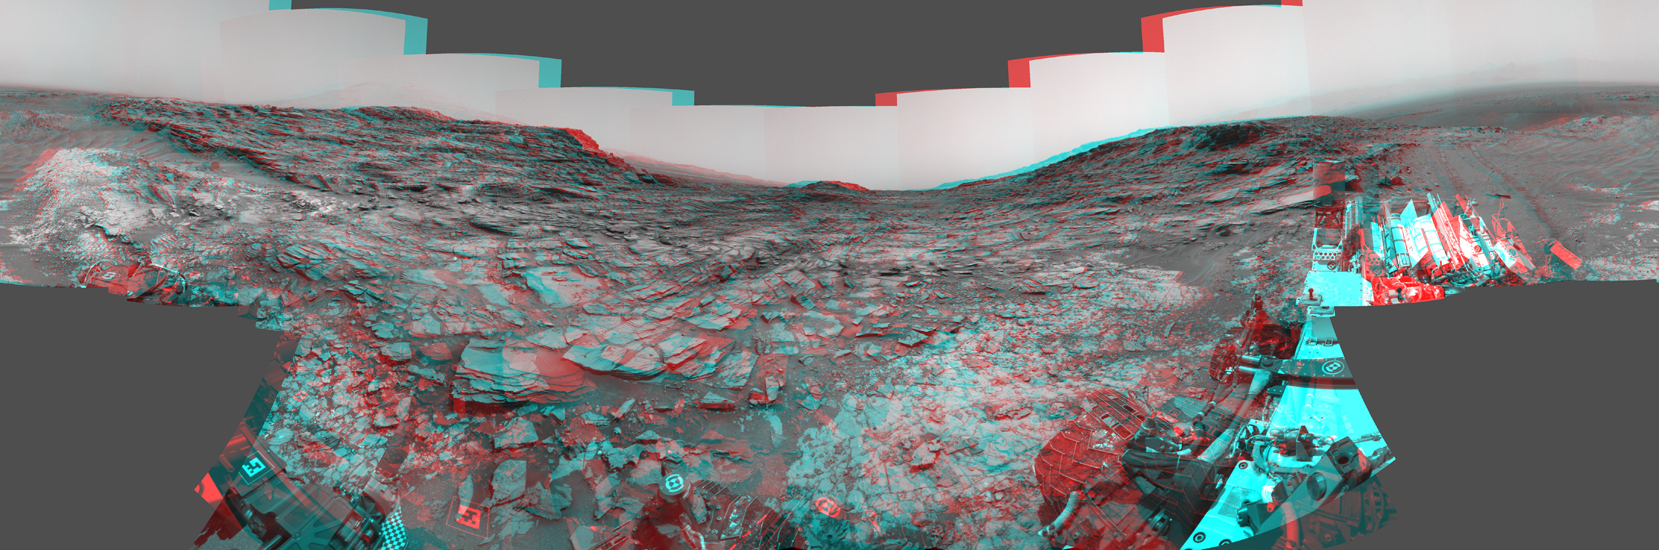 mars-curiosity-rover-msl-navcam-pia19678-br